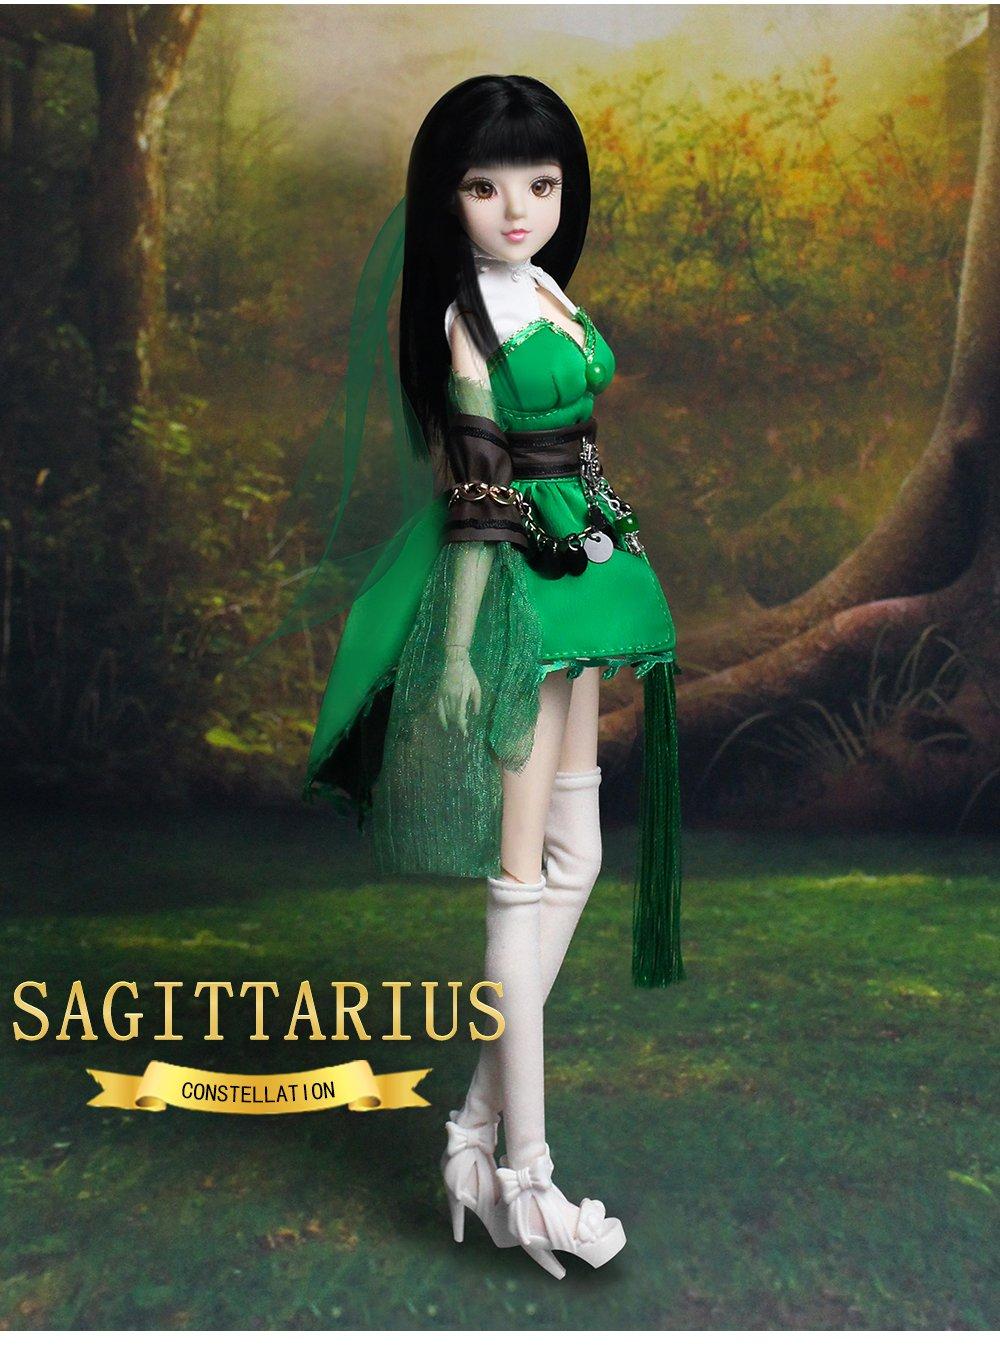 Mystery Magic Girl Fortune Days BJD doll 12 inch Twelve constellation series doll (SAGITTARIUS)